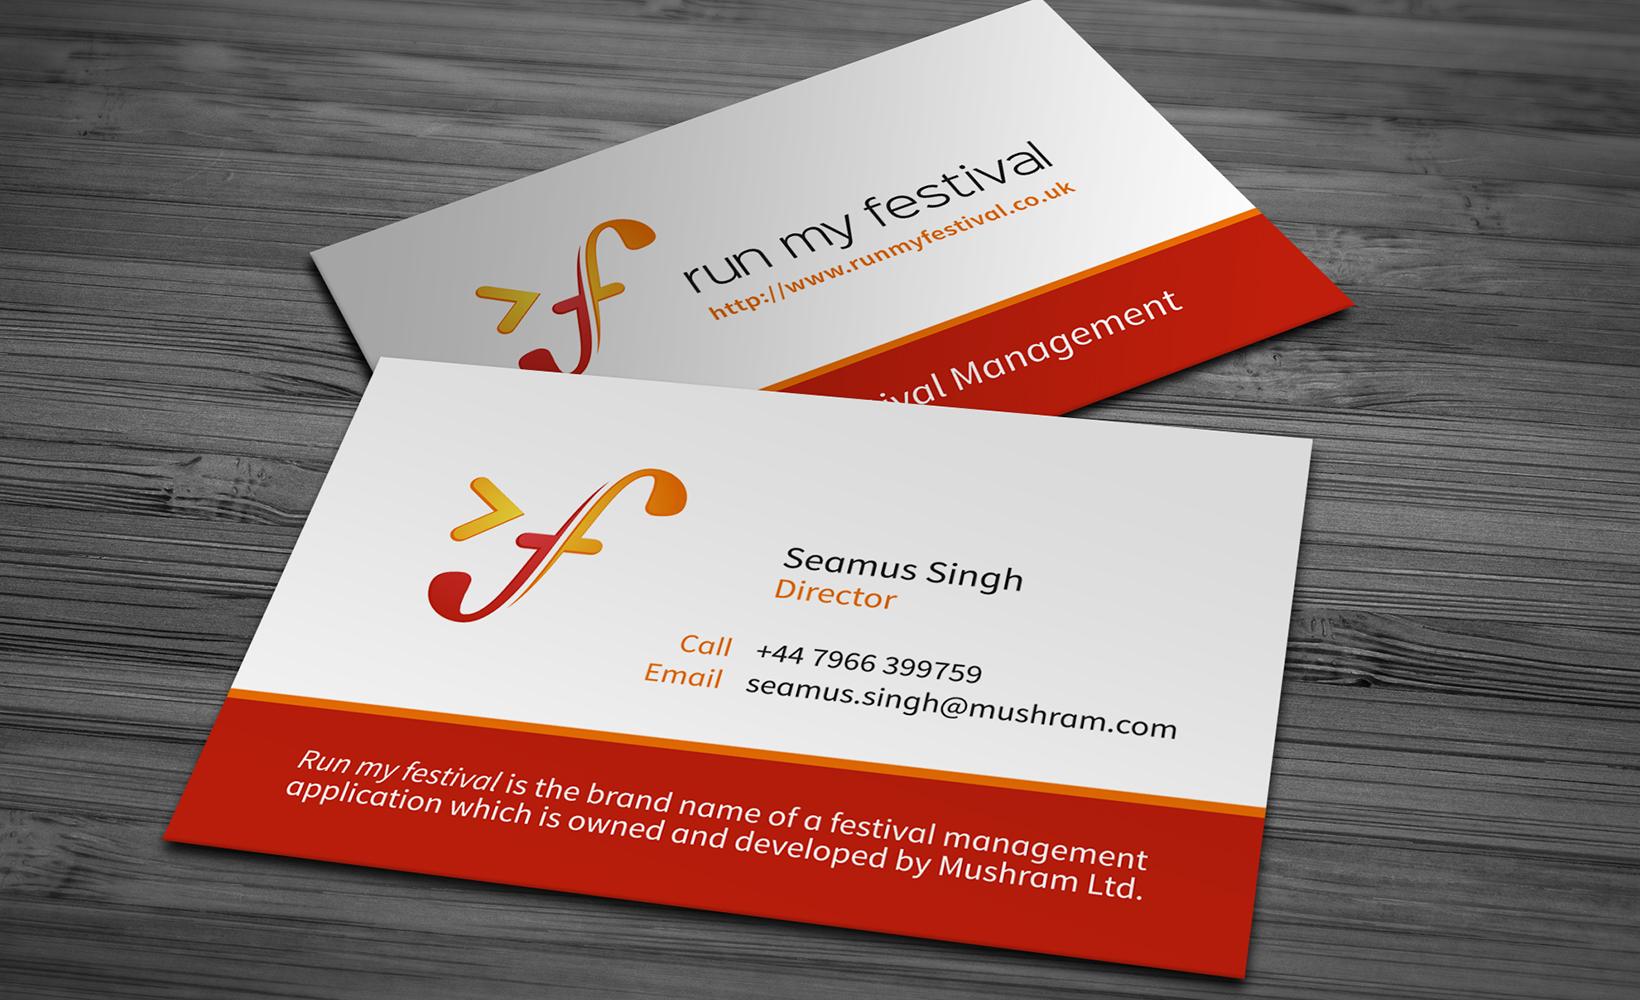 Print design bigbluecurrant run my festival business card design reheart Images